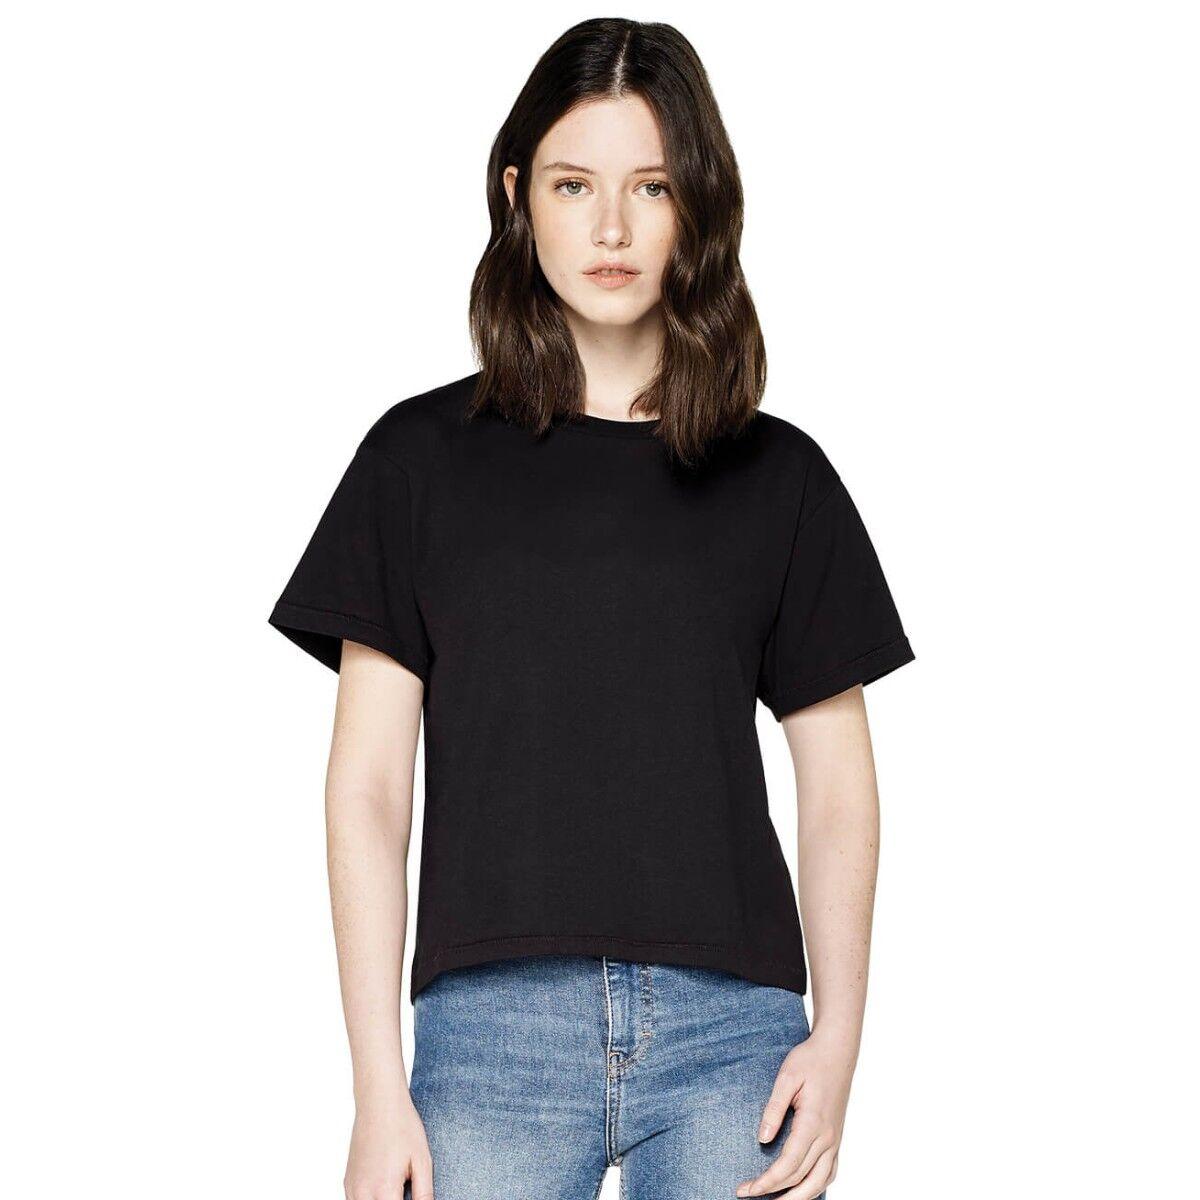 Ladies Earth Positive Short Loose Fit T-shirt -  Black